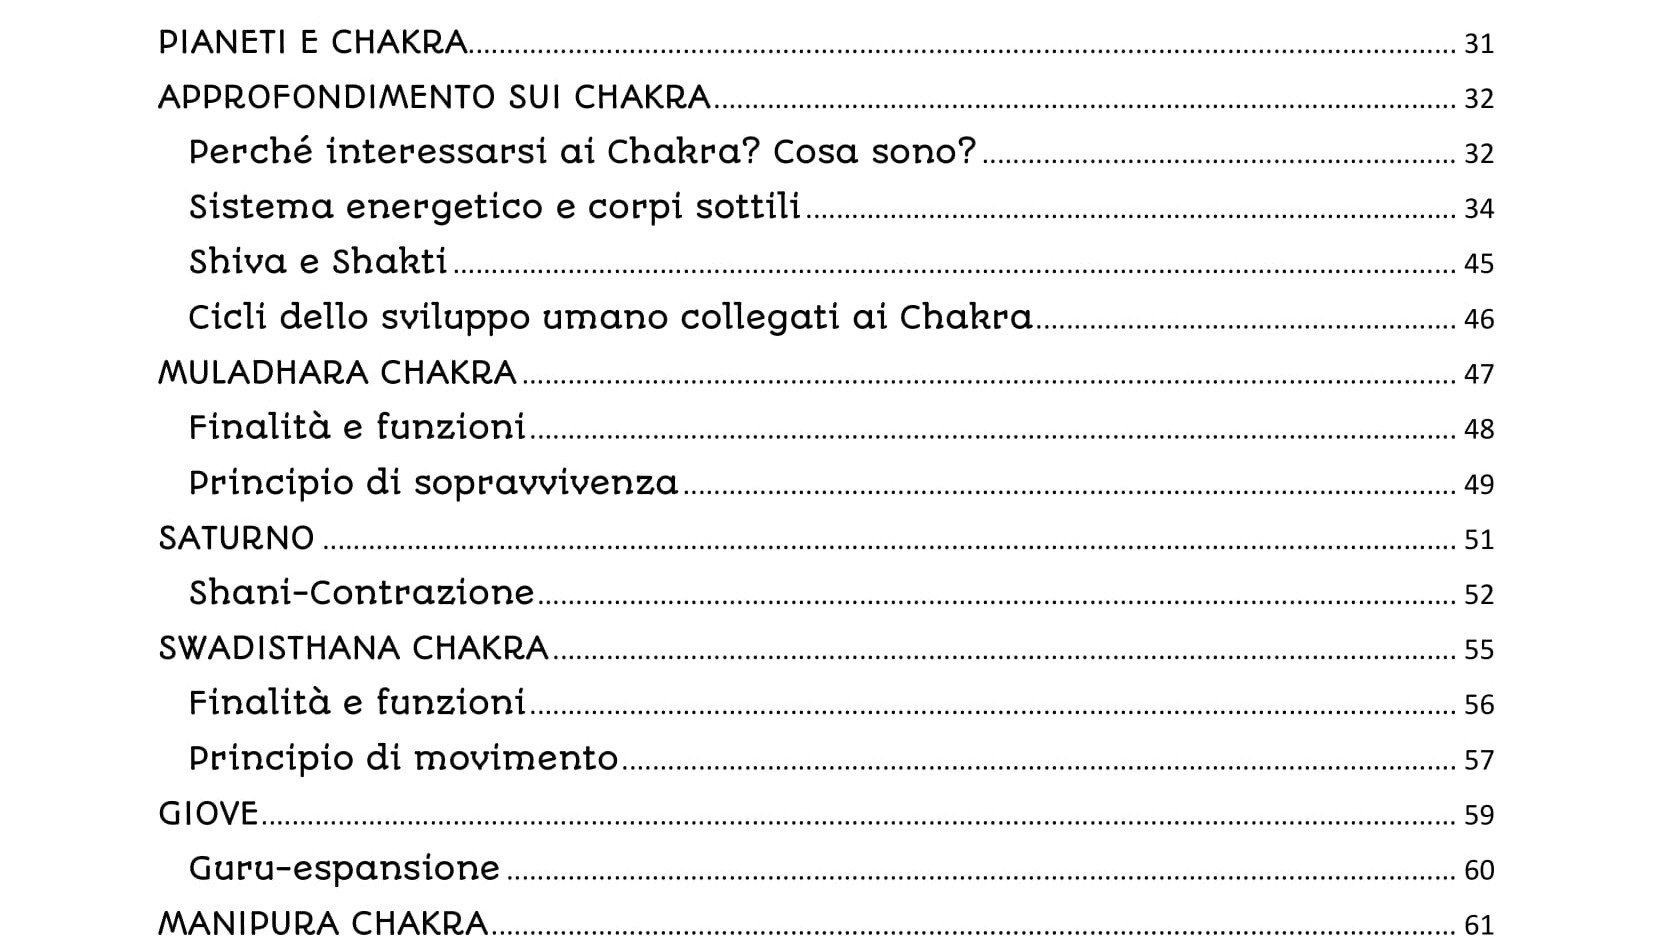 Indice Manuale Astrologia Vedica-2.jpg